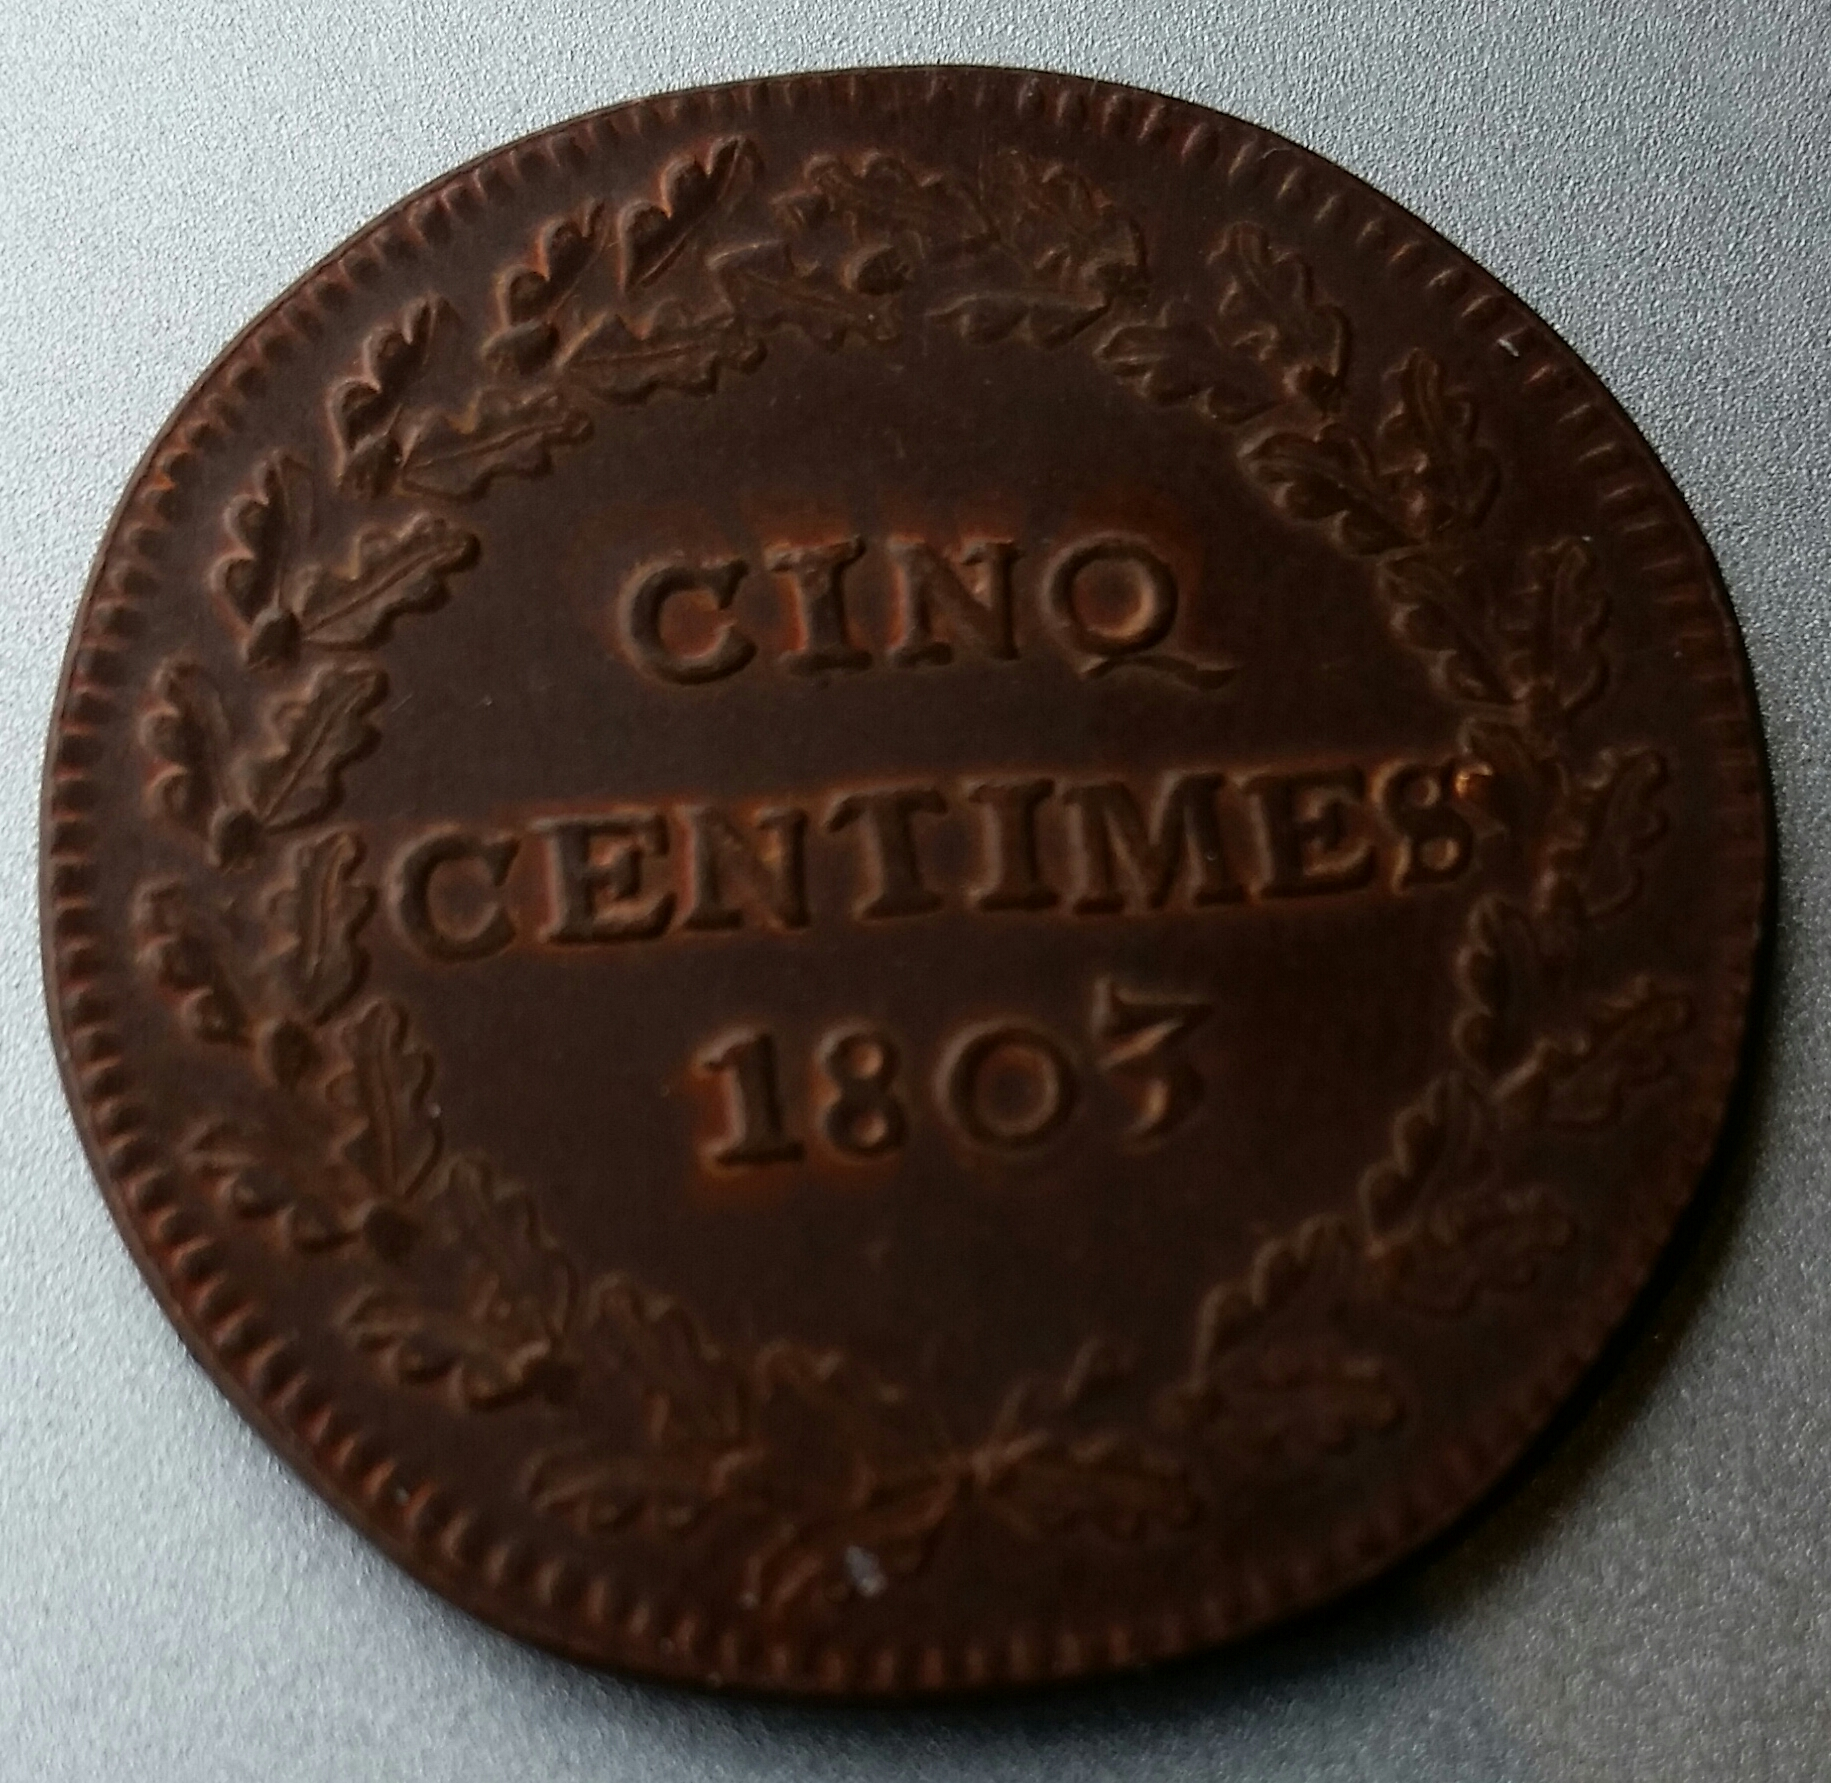 CINQ CENTIMES1803